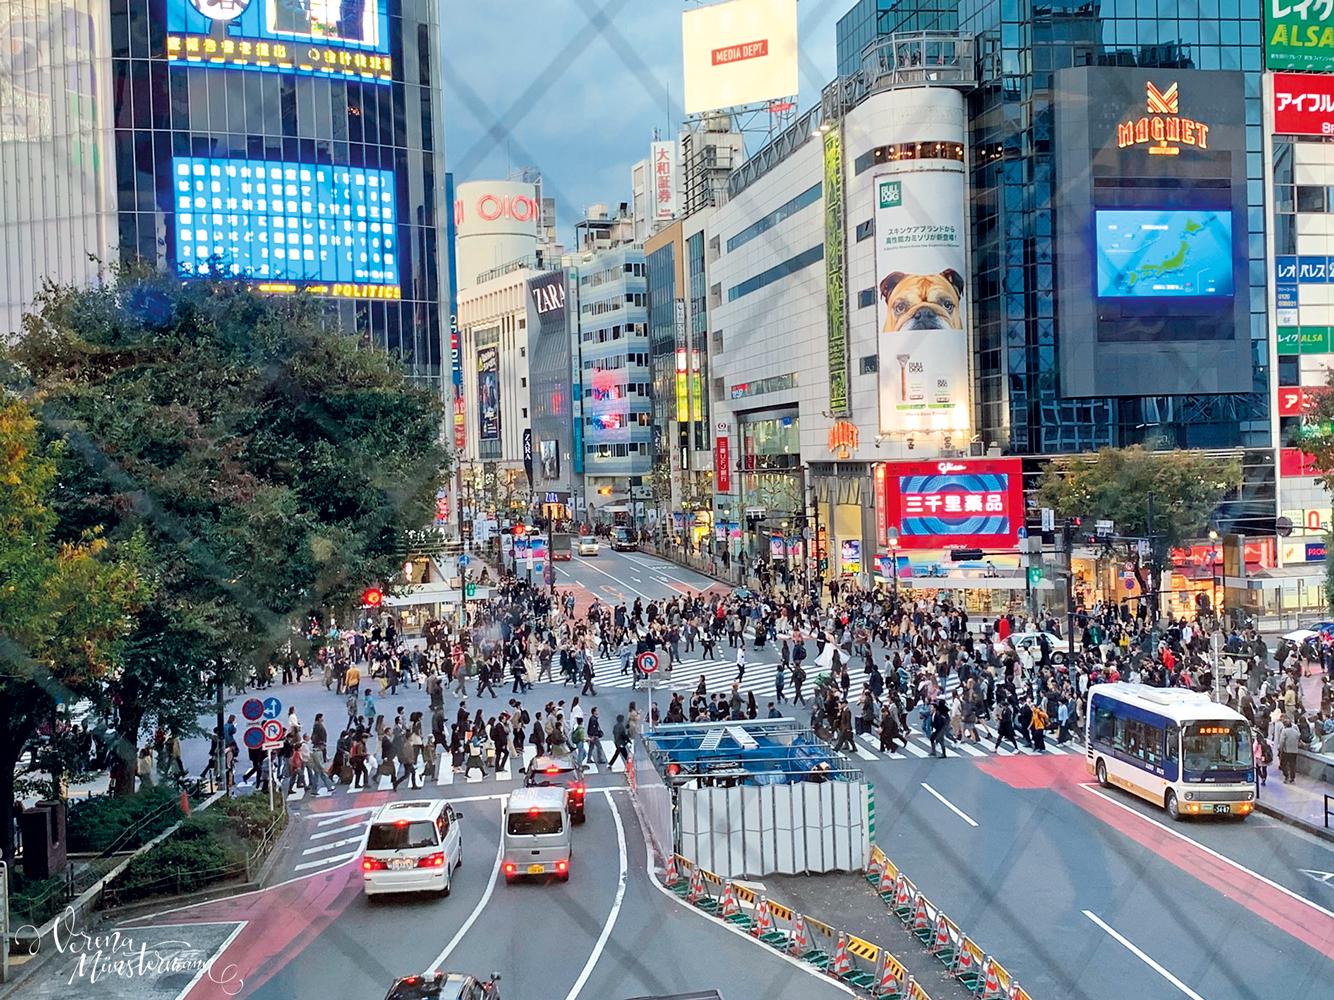 shibuya crossing - nach-Japan-reisen - tokio - verenamuenstermann